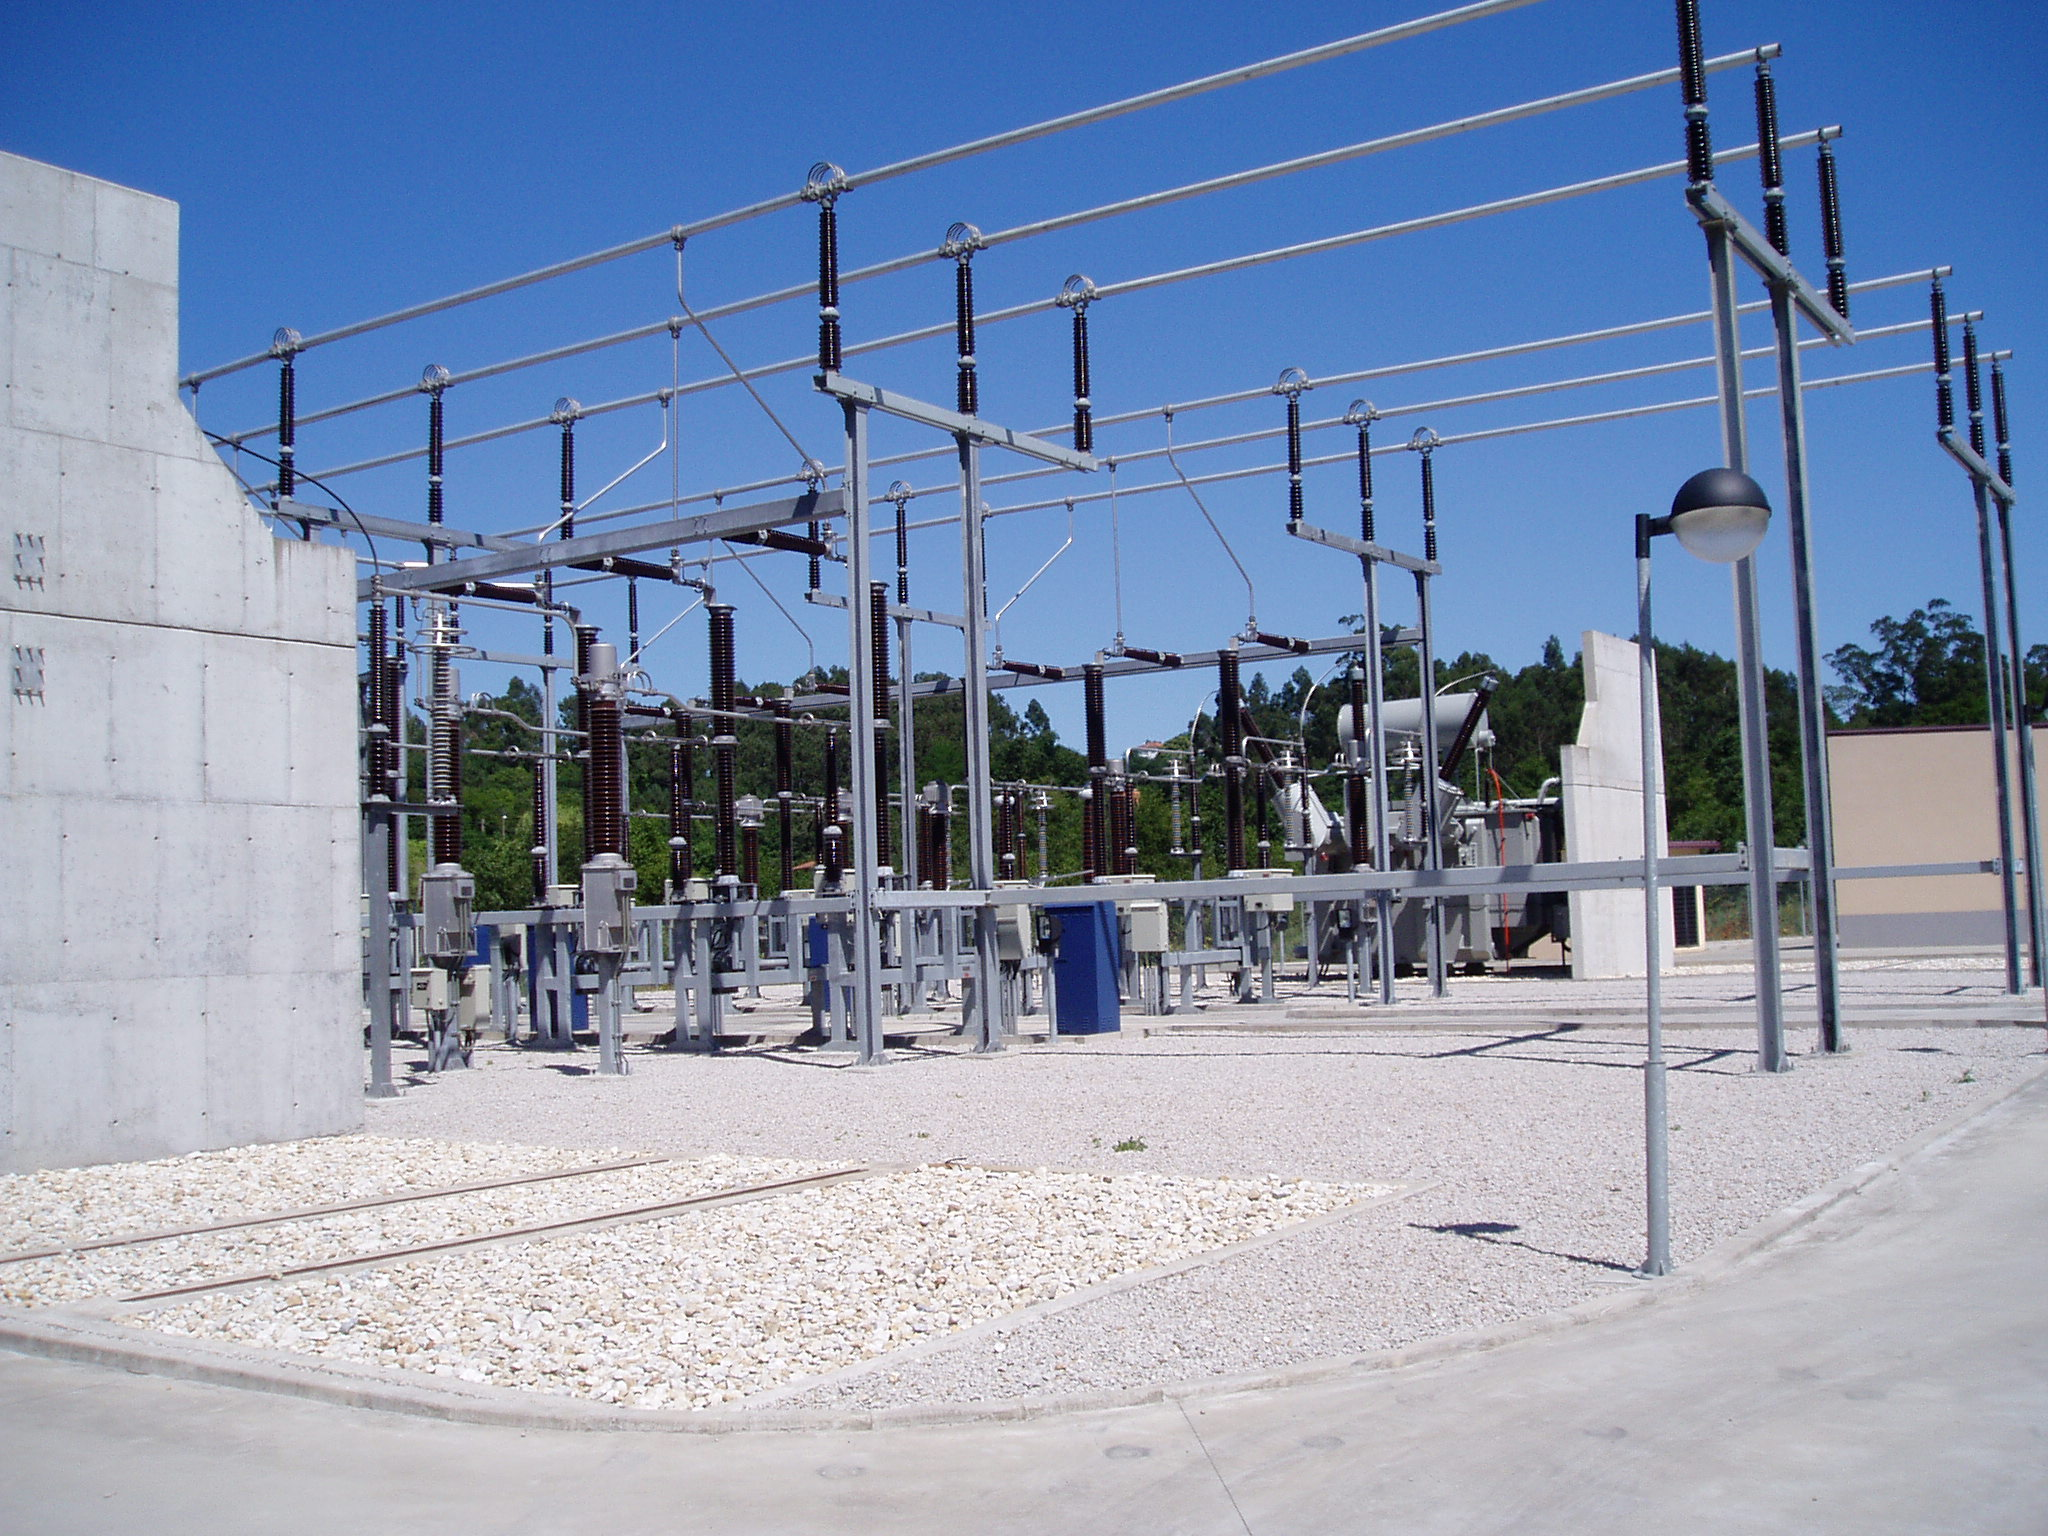 Foto playa Lourido. Sub. Lourizan  220/66 kV  y   220/20 kV